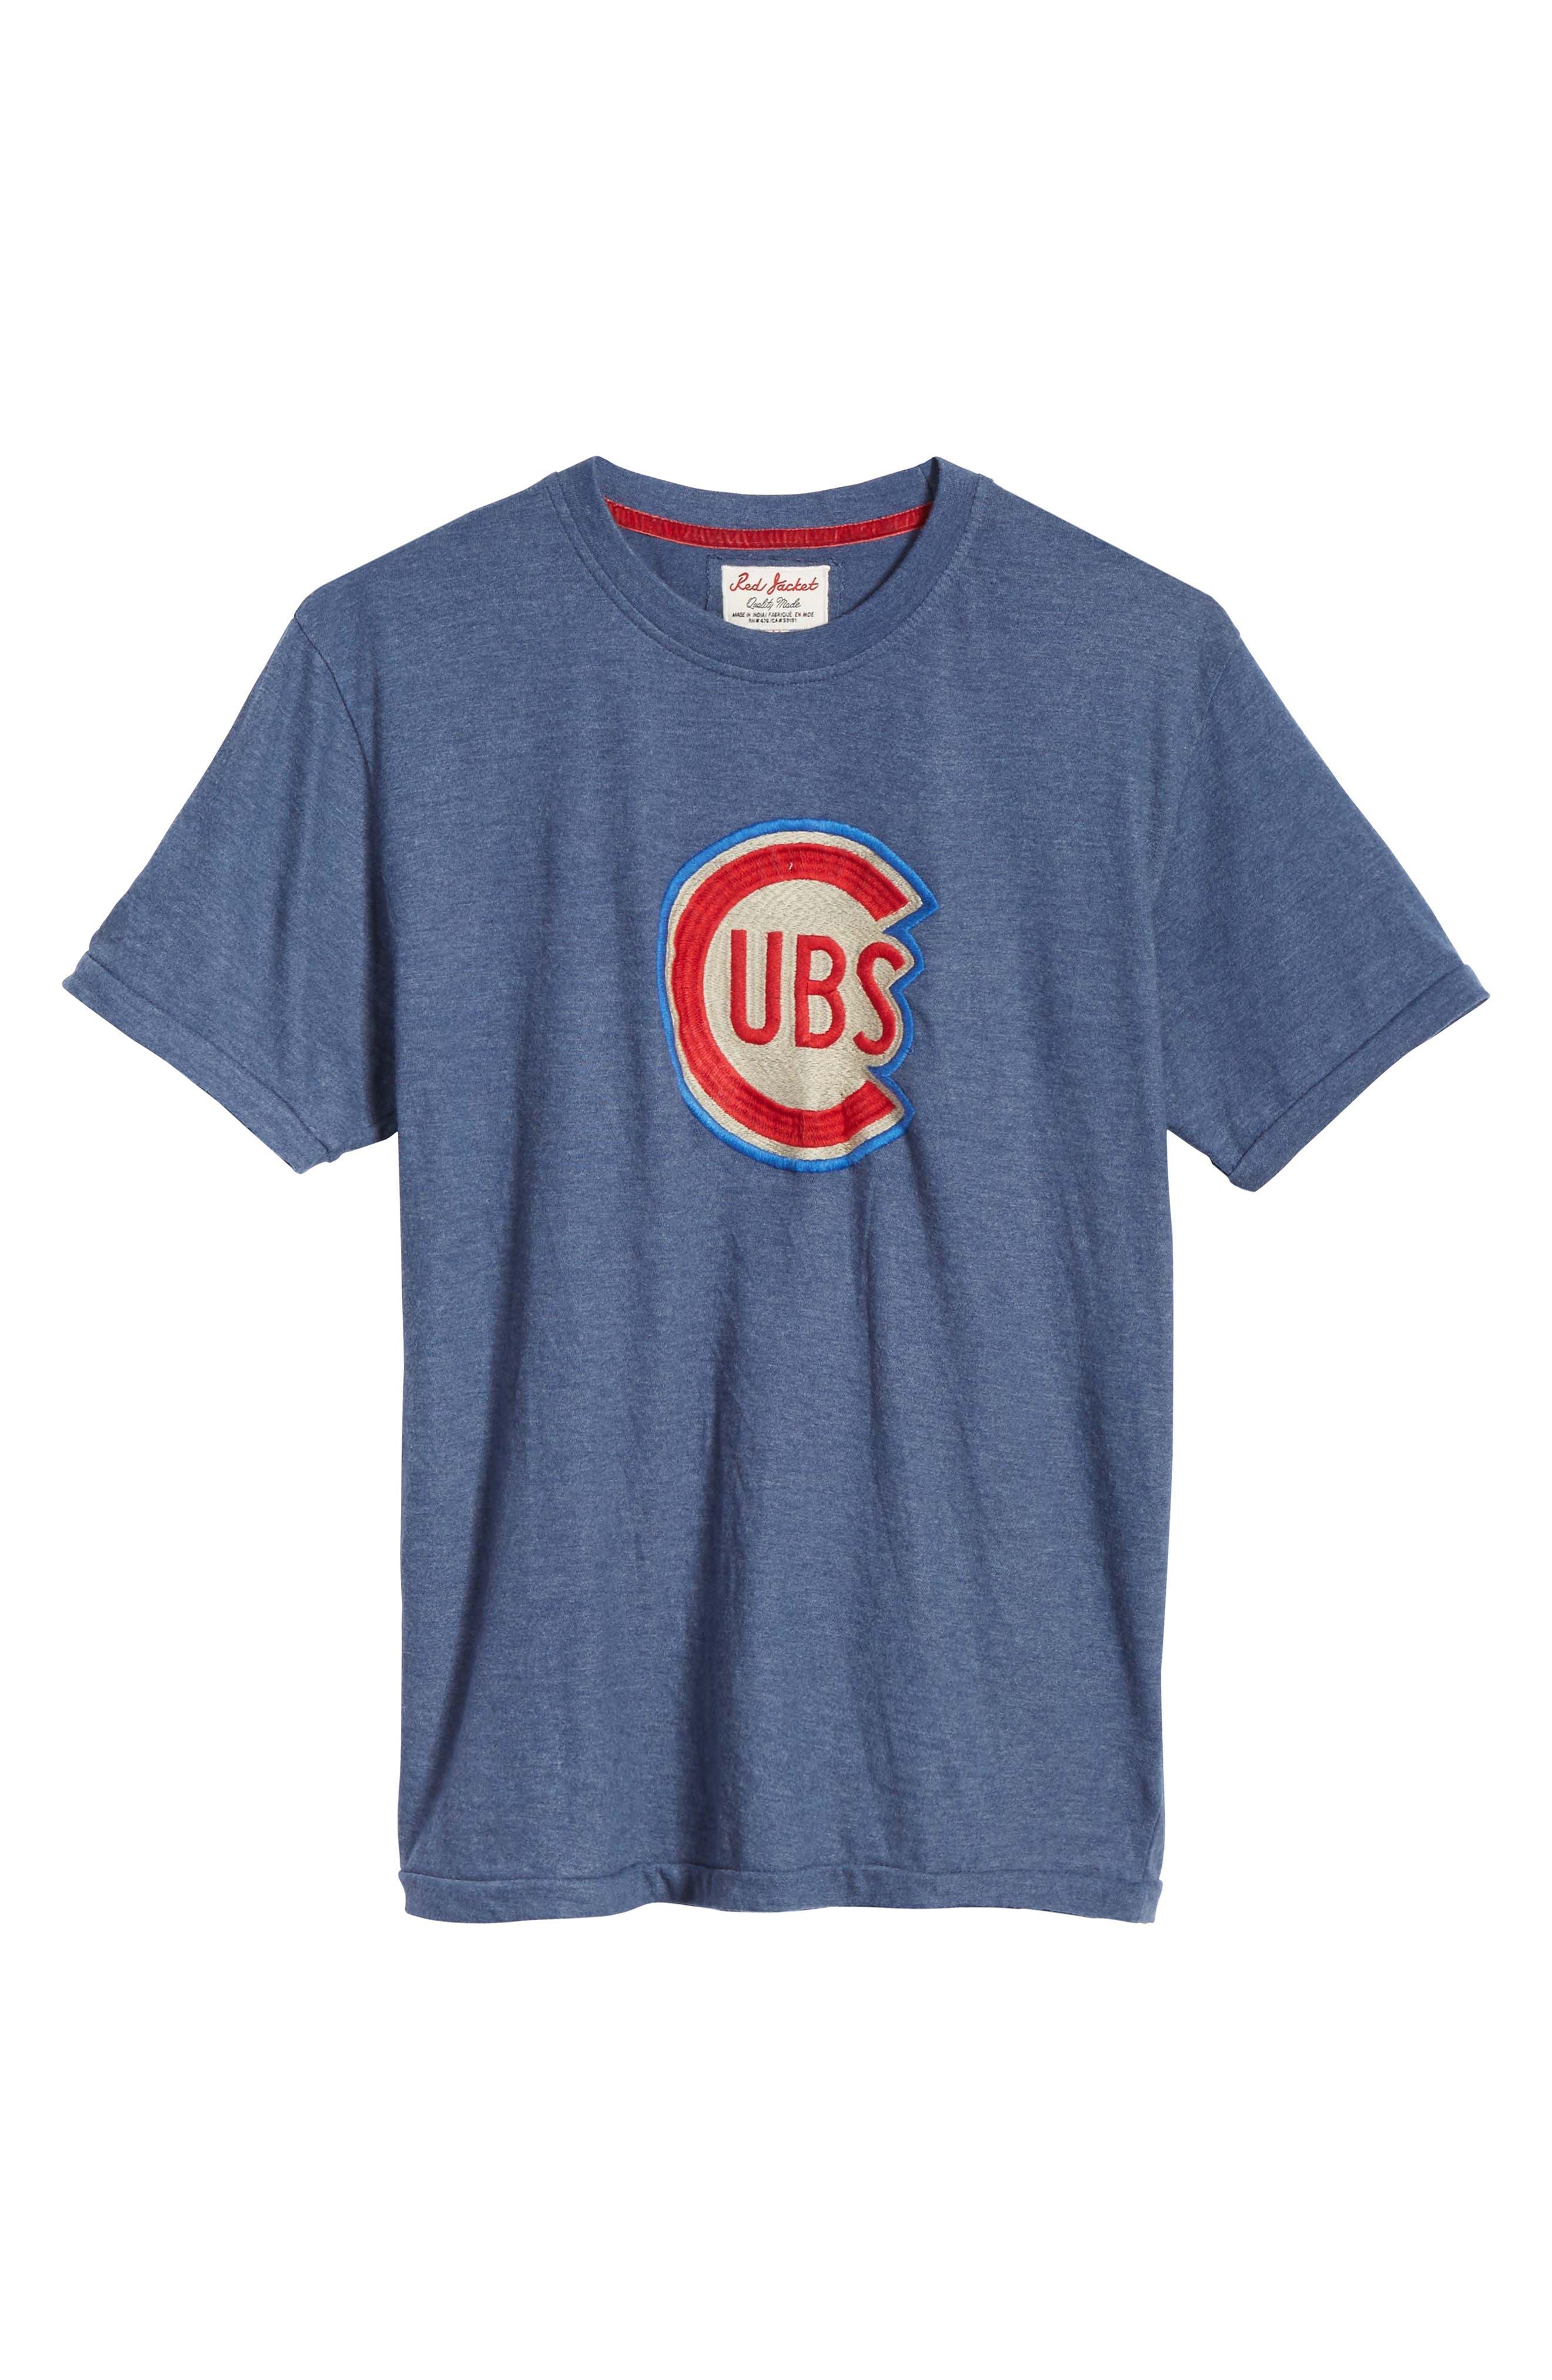 Hillwood Chicago Cubs T-Shirt,                             Alternate thumbnail 6, color,                             422